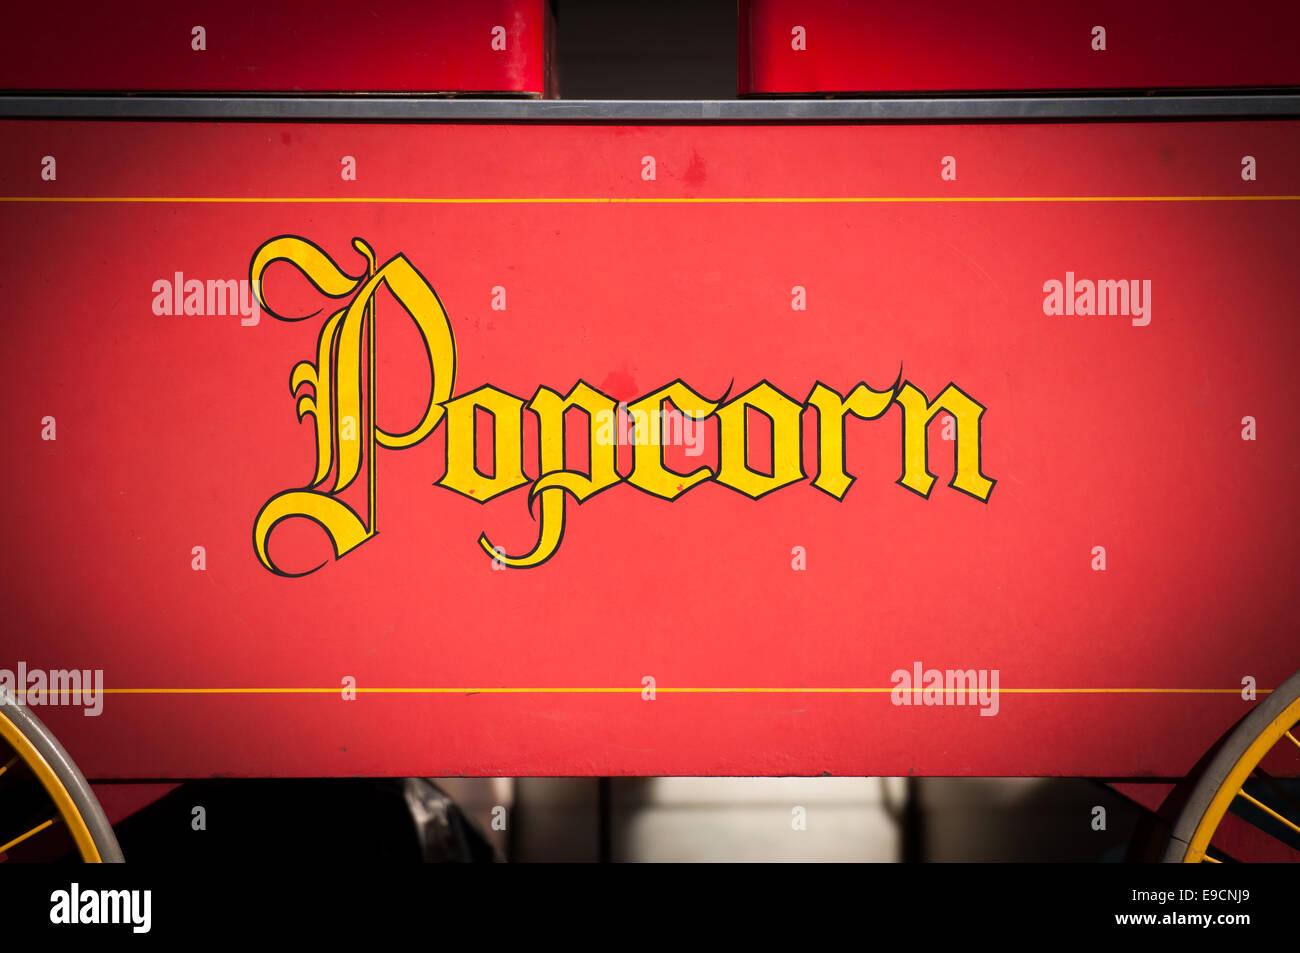 cinema popcorn maker instructions